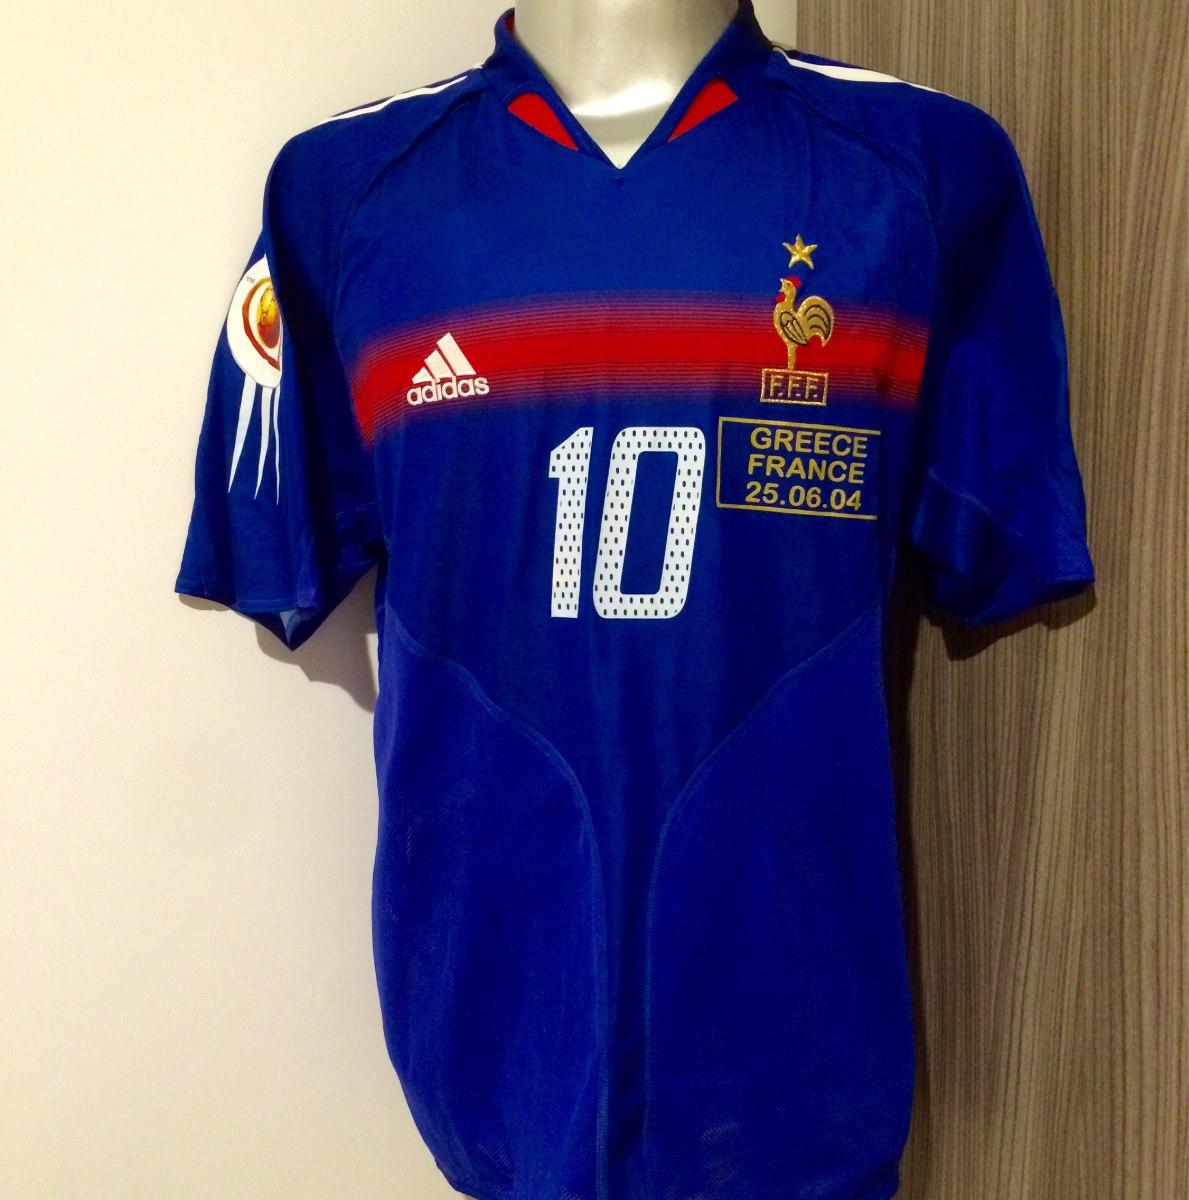 734d0cbdd4887 Camisa França Home Fifa Euro 2004 (10 zidane) - R  400